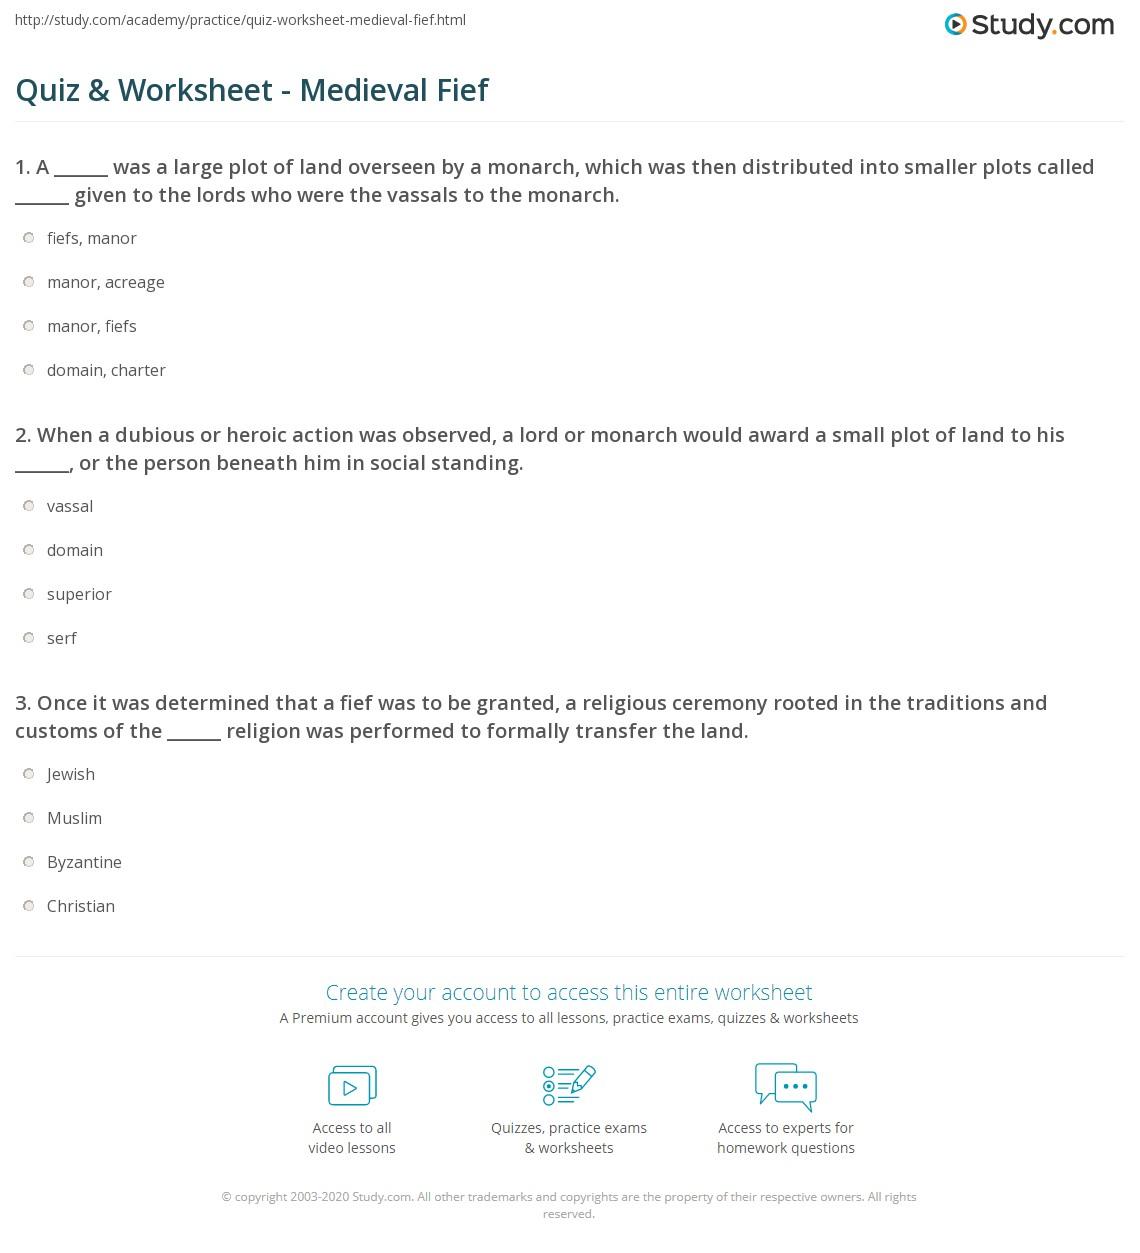 Attractive Print Medieval Fief: Definition U0026 Overview Worksheet